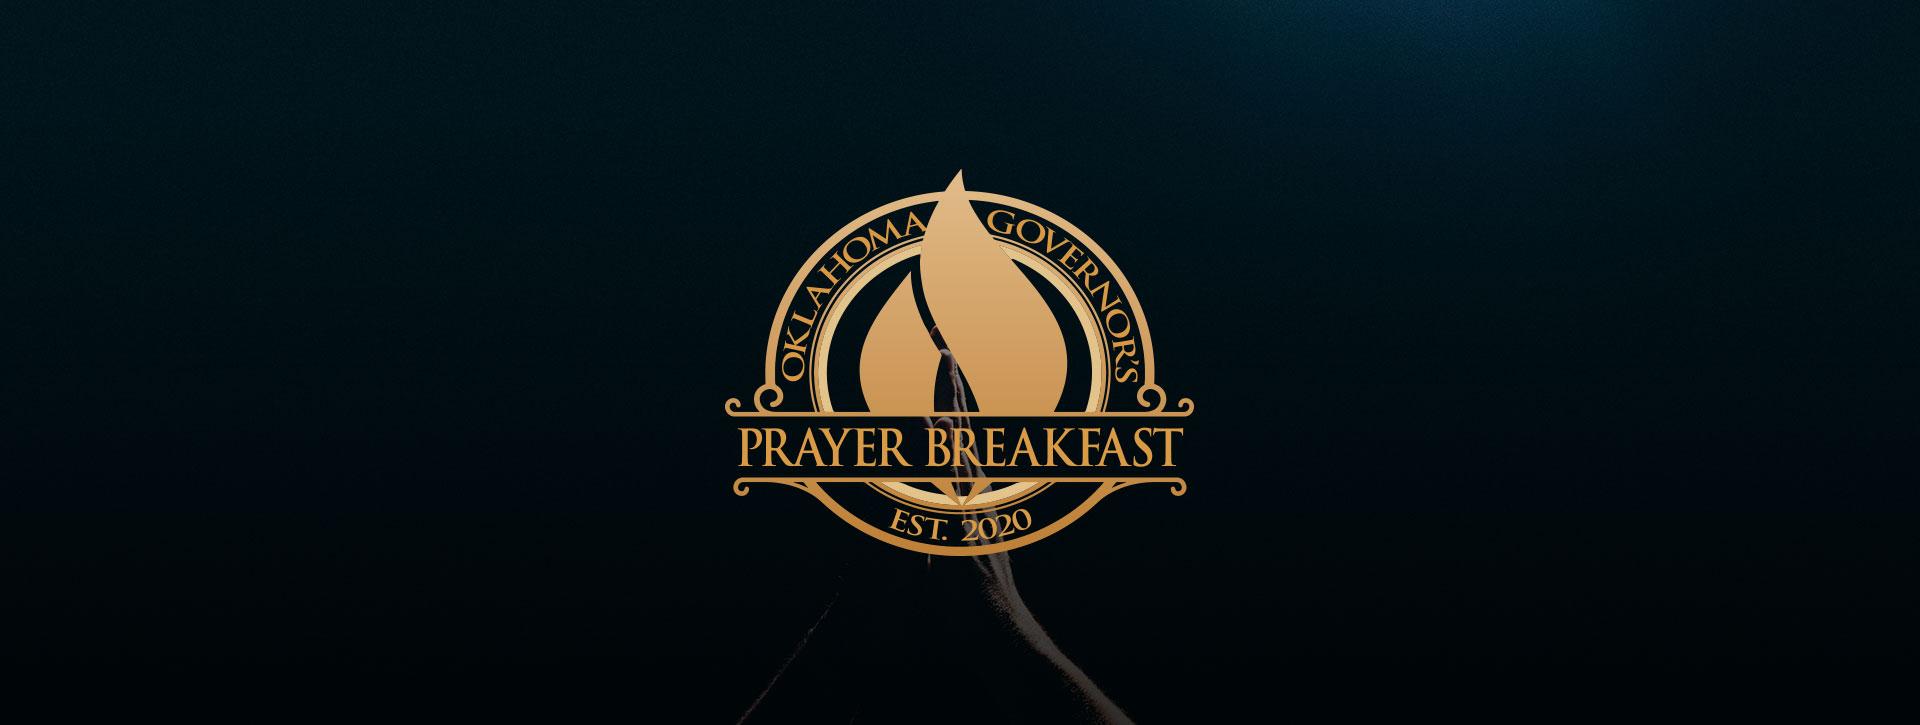 Event: Oklahoma Governor's Prayed Breakfast